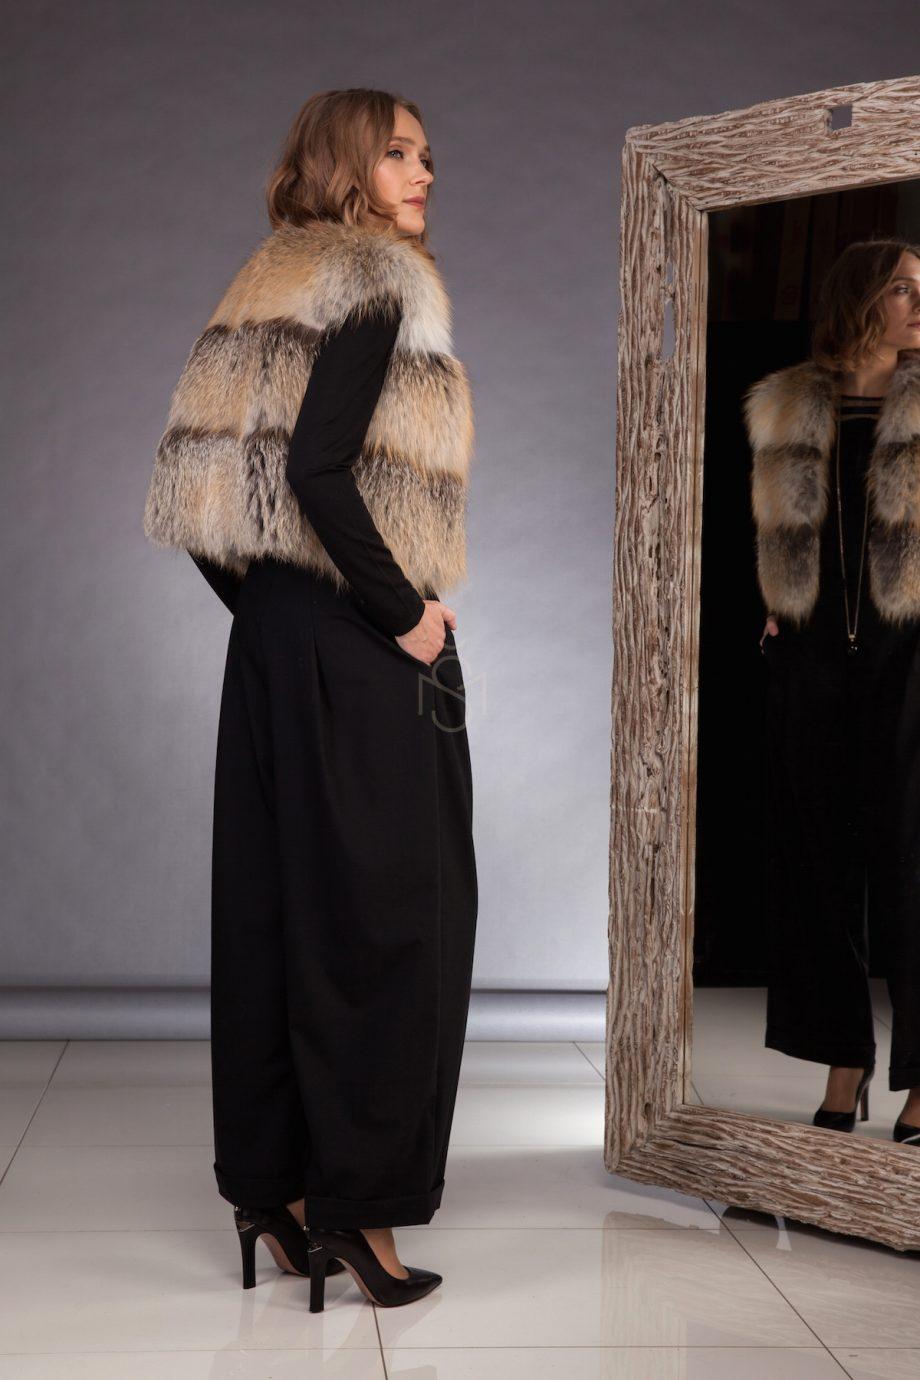 High quality fox fur vest made by SILTA MADA fur studio in Vilnius